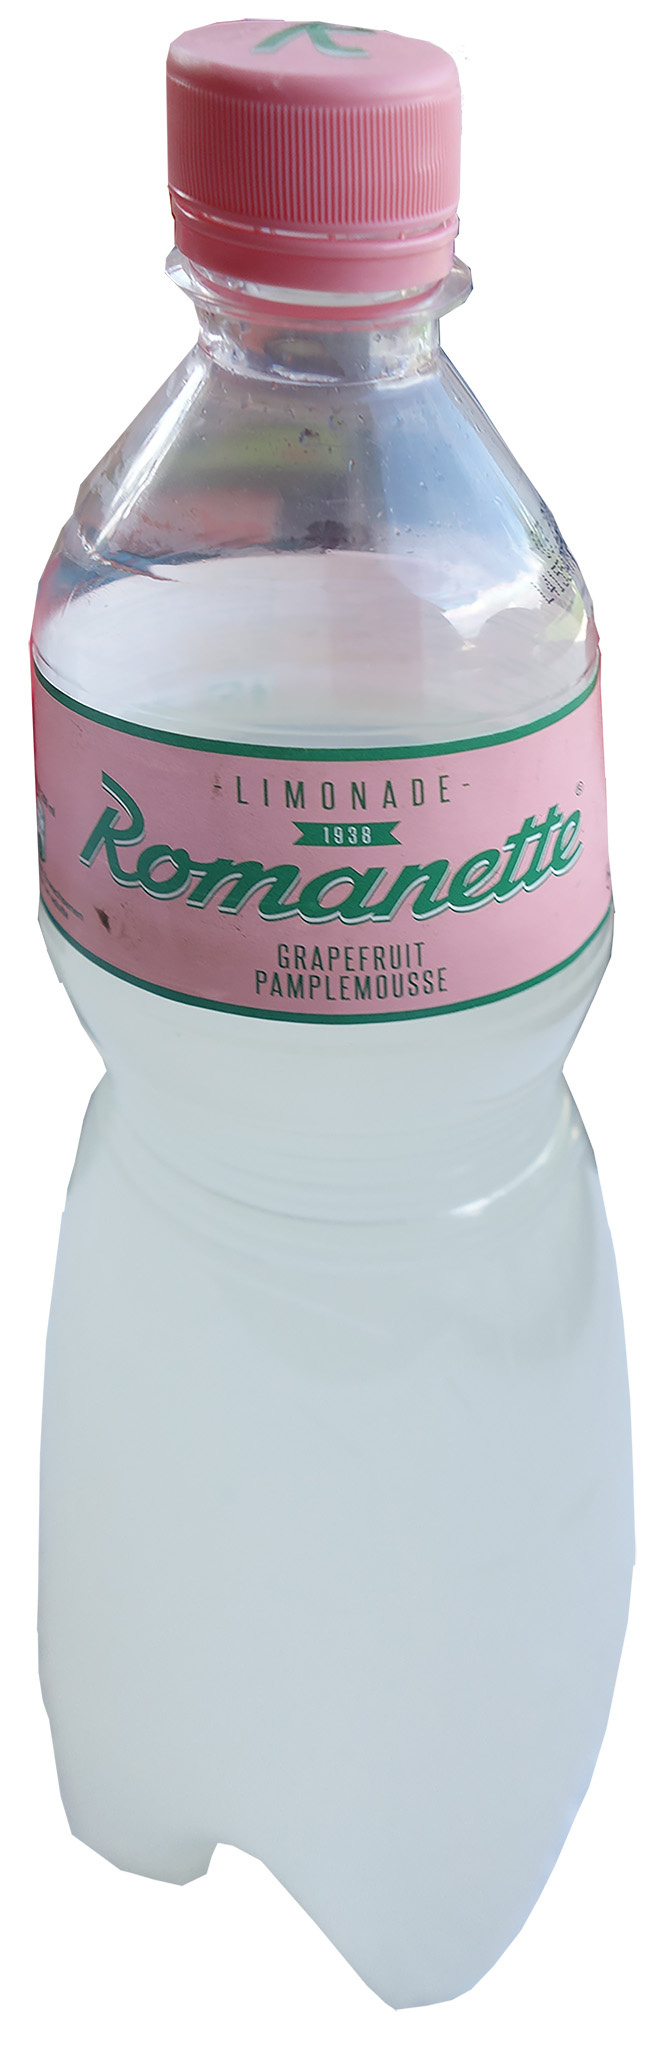 Romanette Limonade Grapefruit - Product - fr